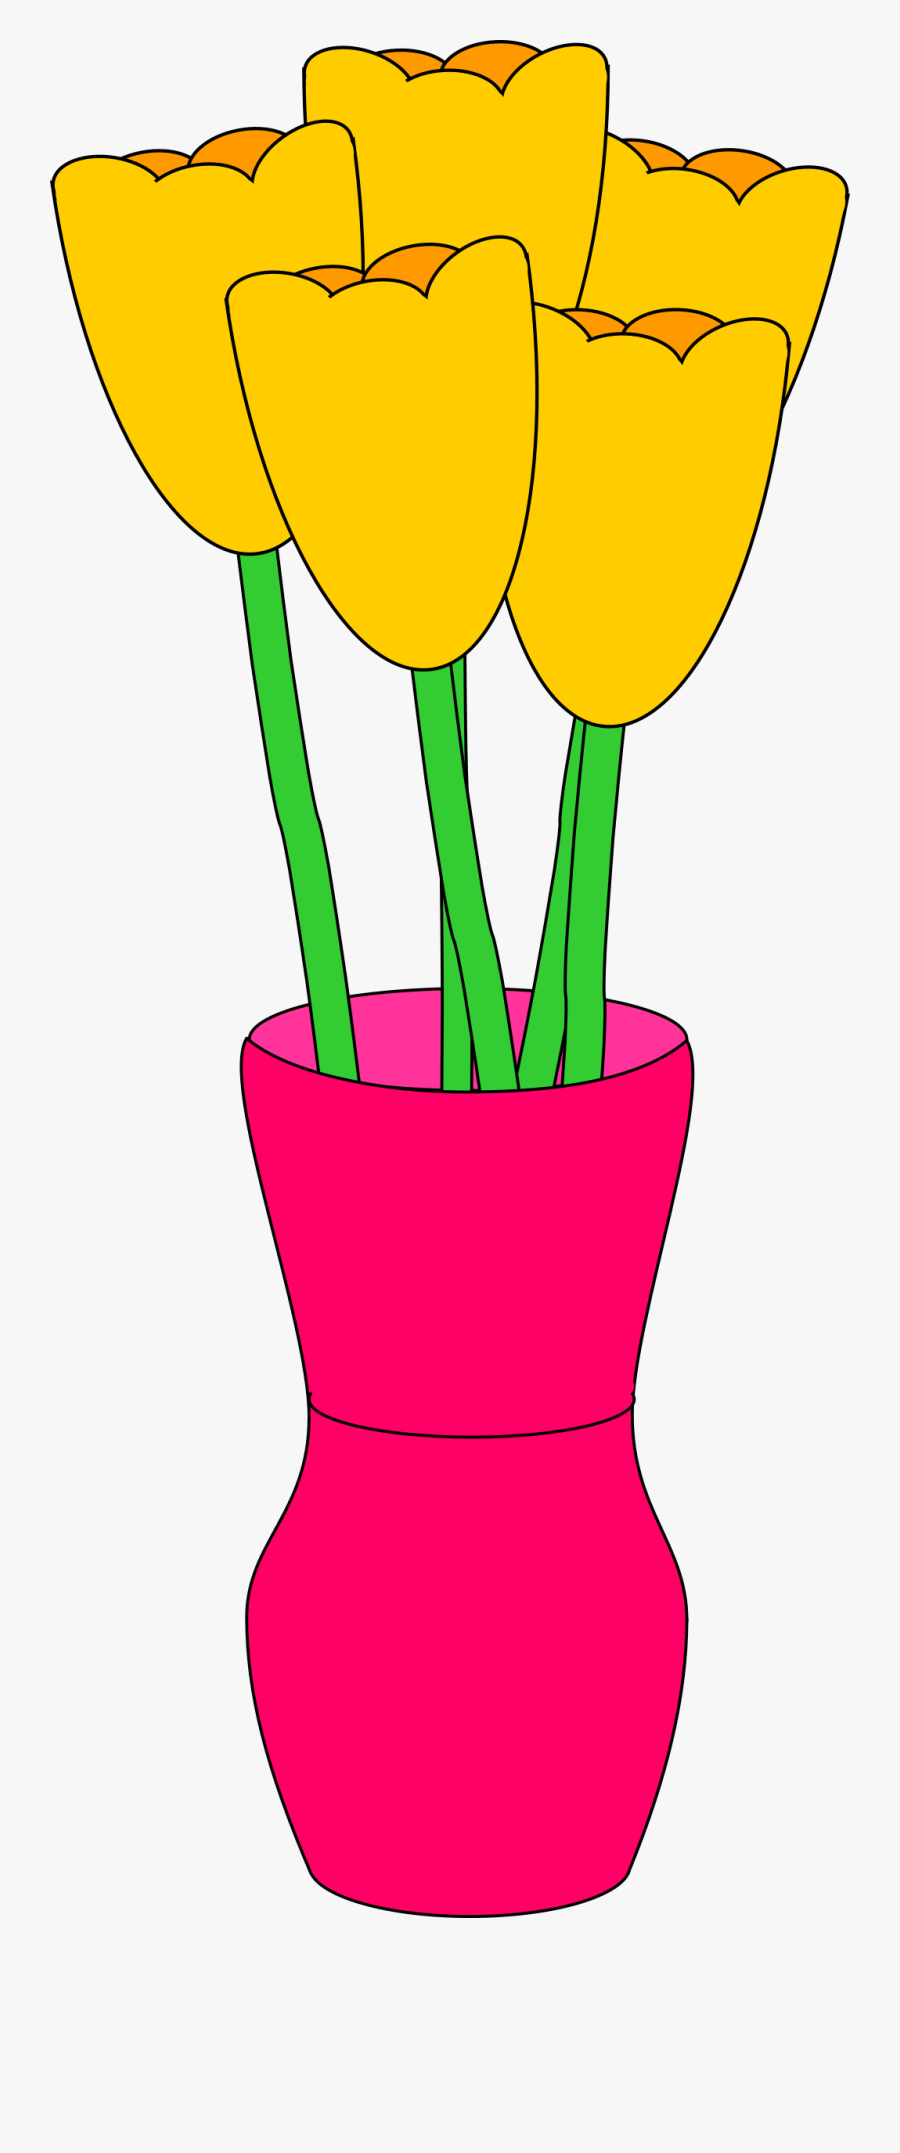 Pink Vase Of Tulips Clip Arts - Tulip In Vase Clipart, Transparent Clipart